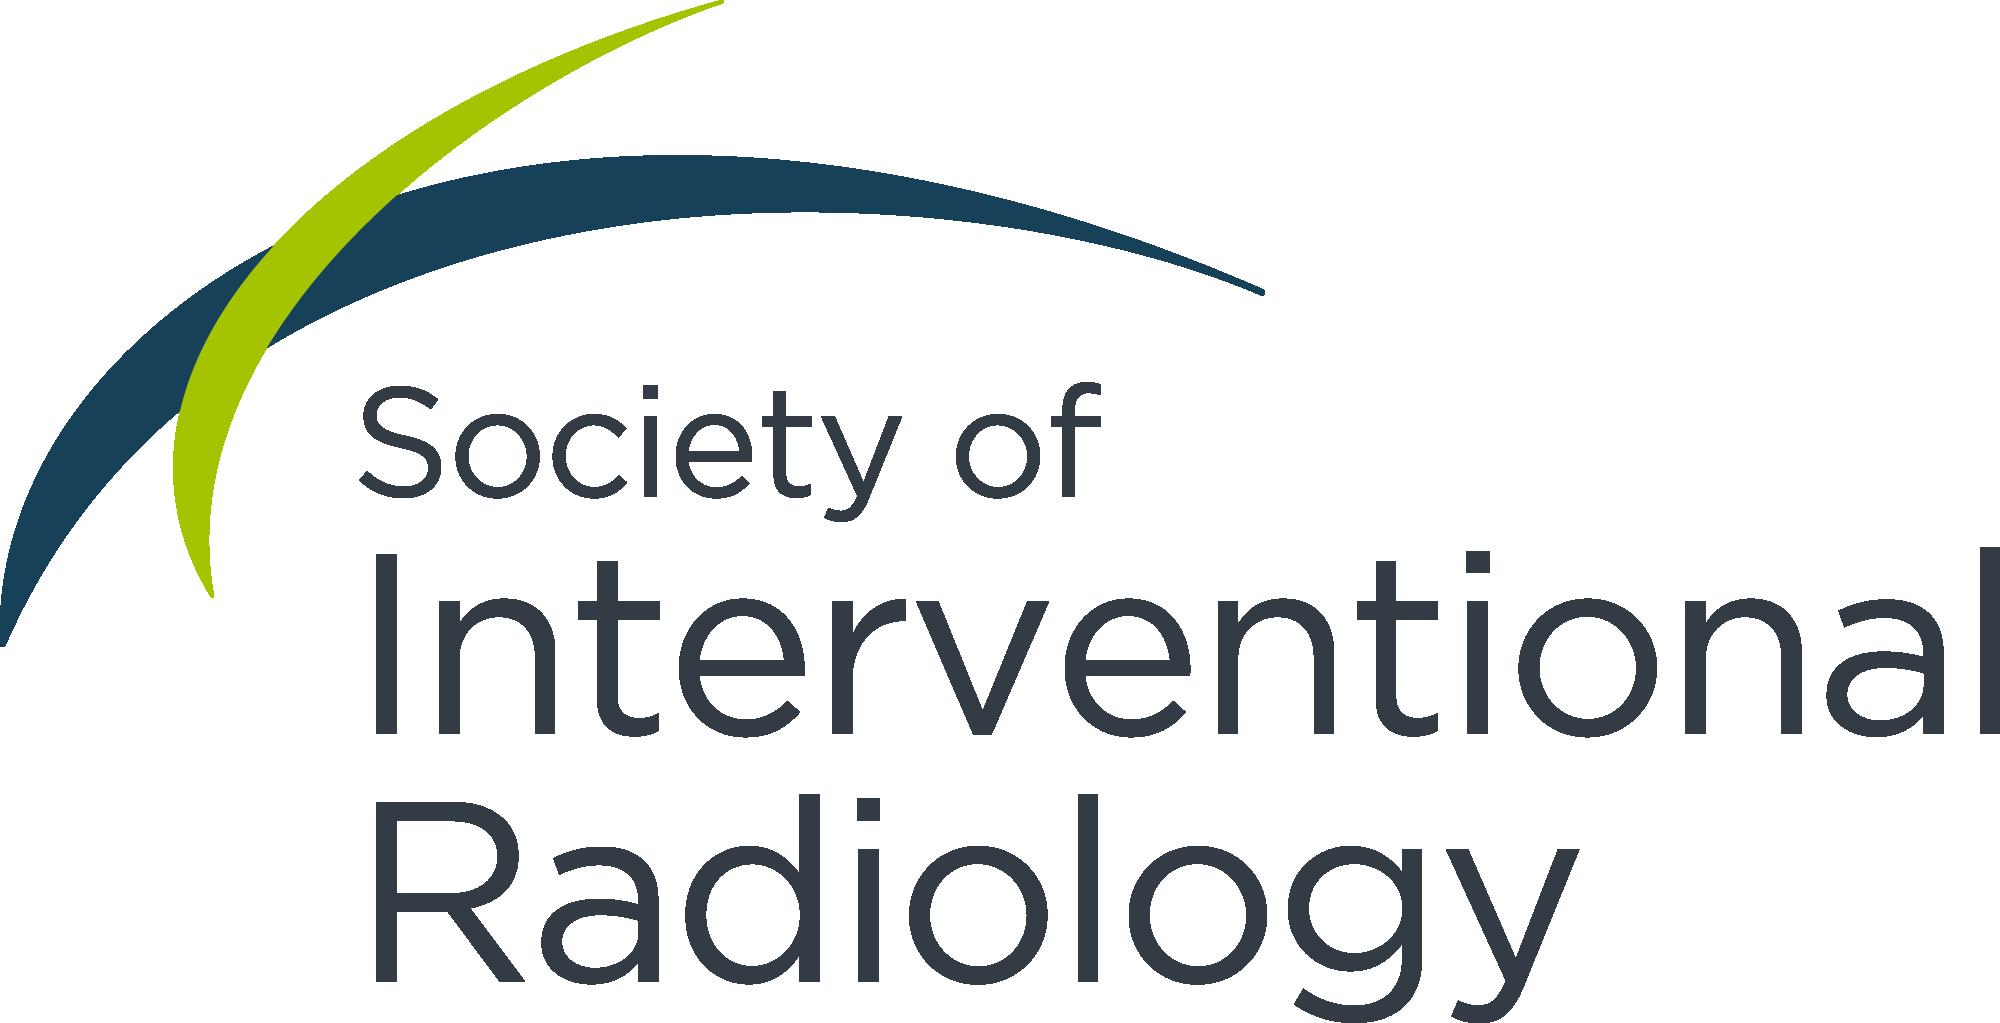 Society of Interventional Radiologists logo